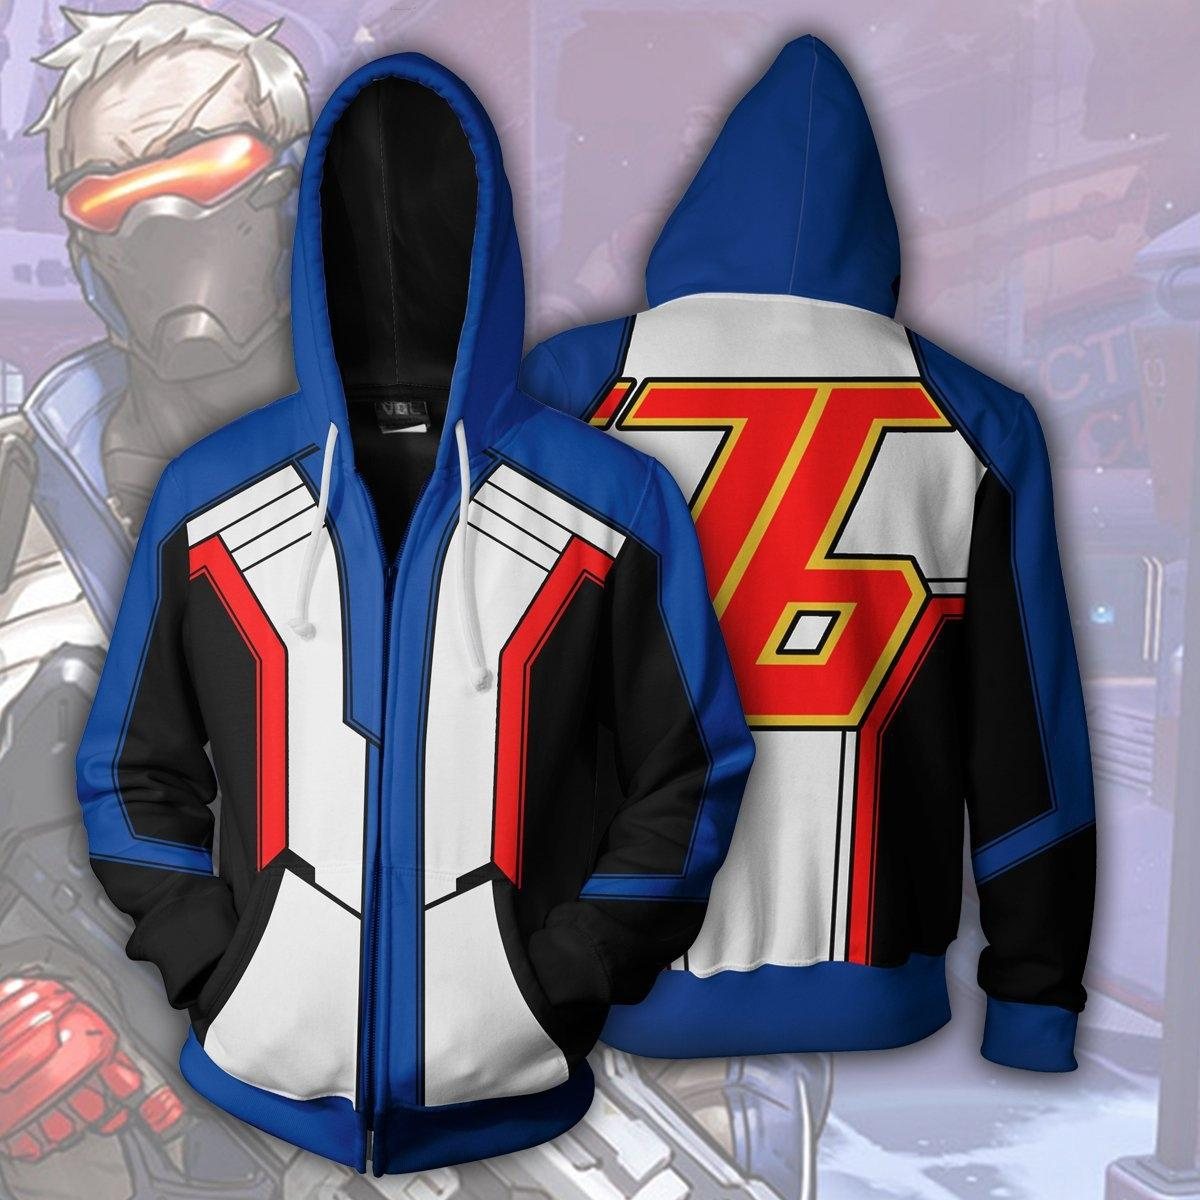 XueYN Nuovo orologio pioniere Soldato serie 76 cardigan cosplay anime periferica nuova vigilanza del hoodie pioniere serie Soldier 76 cardigan con cappuccio EzTmP